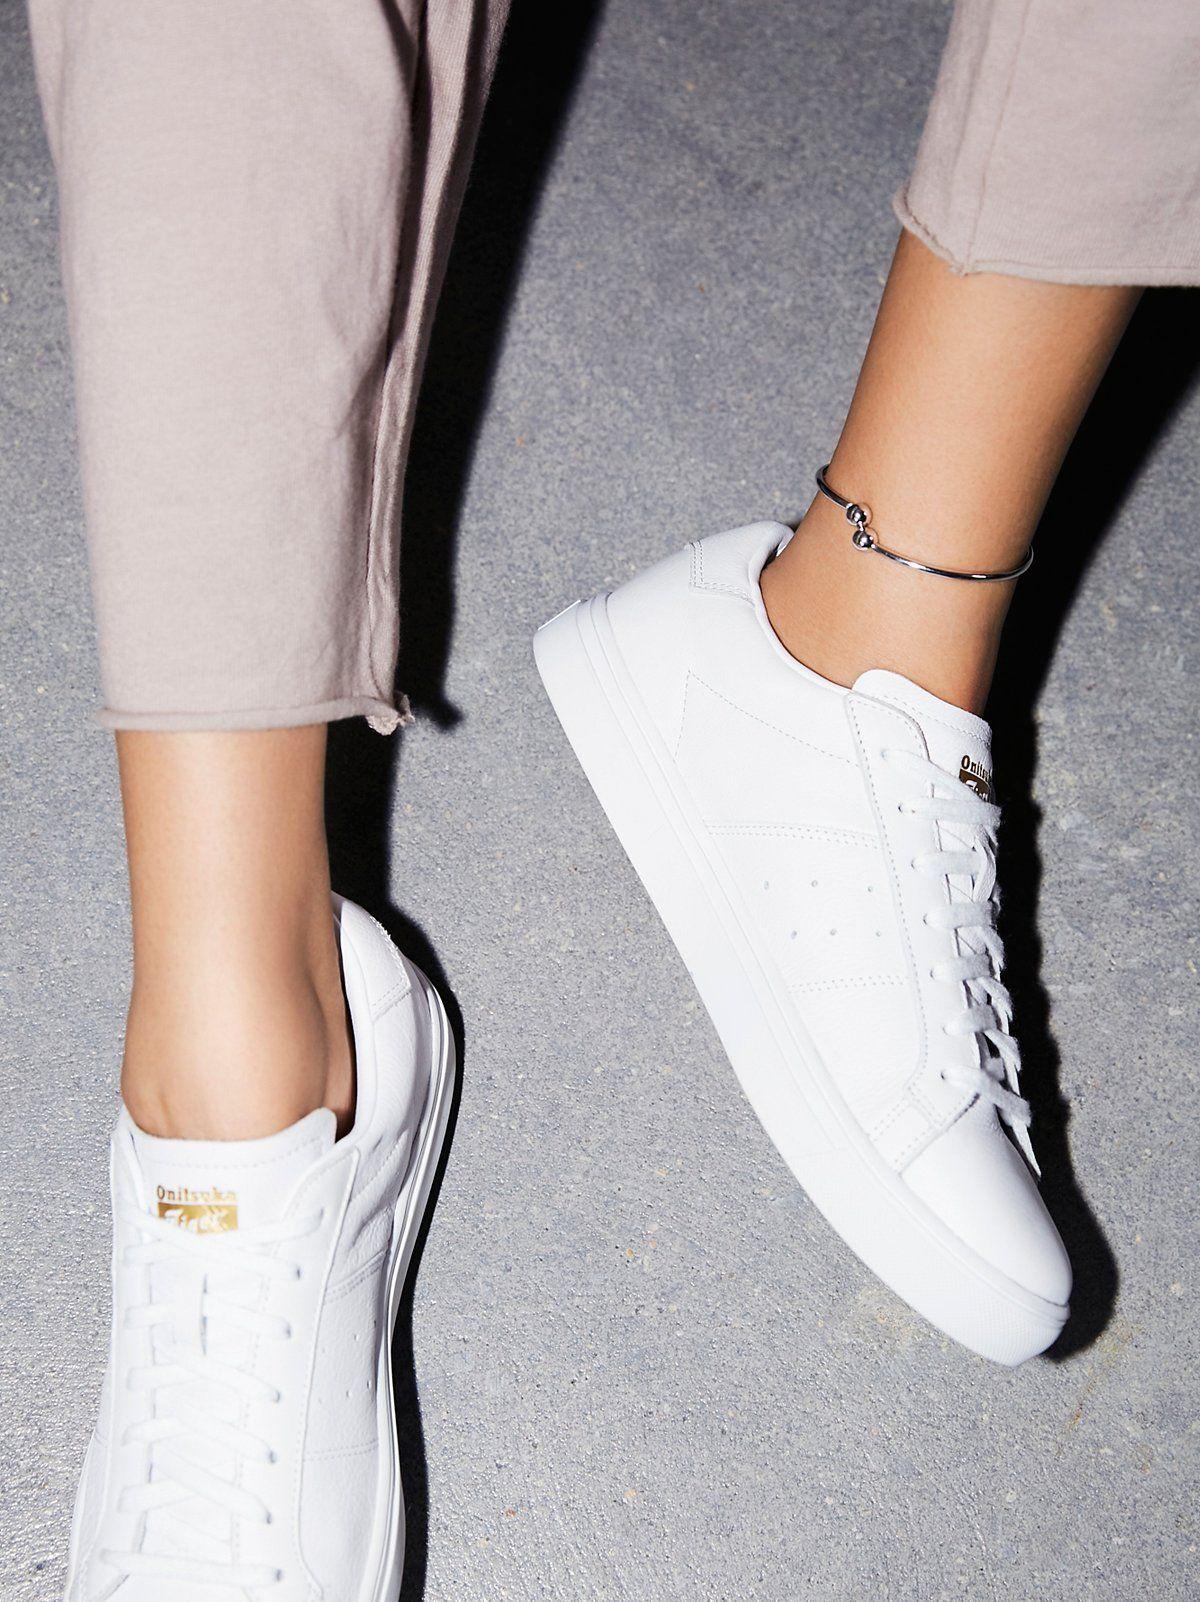 Vans Old Skool vs Adidas Gazelle | Sneaker Comparison + On Feet w Outfit